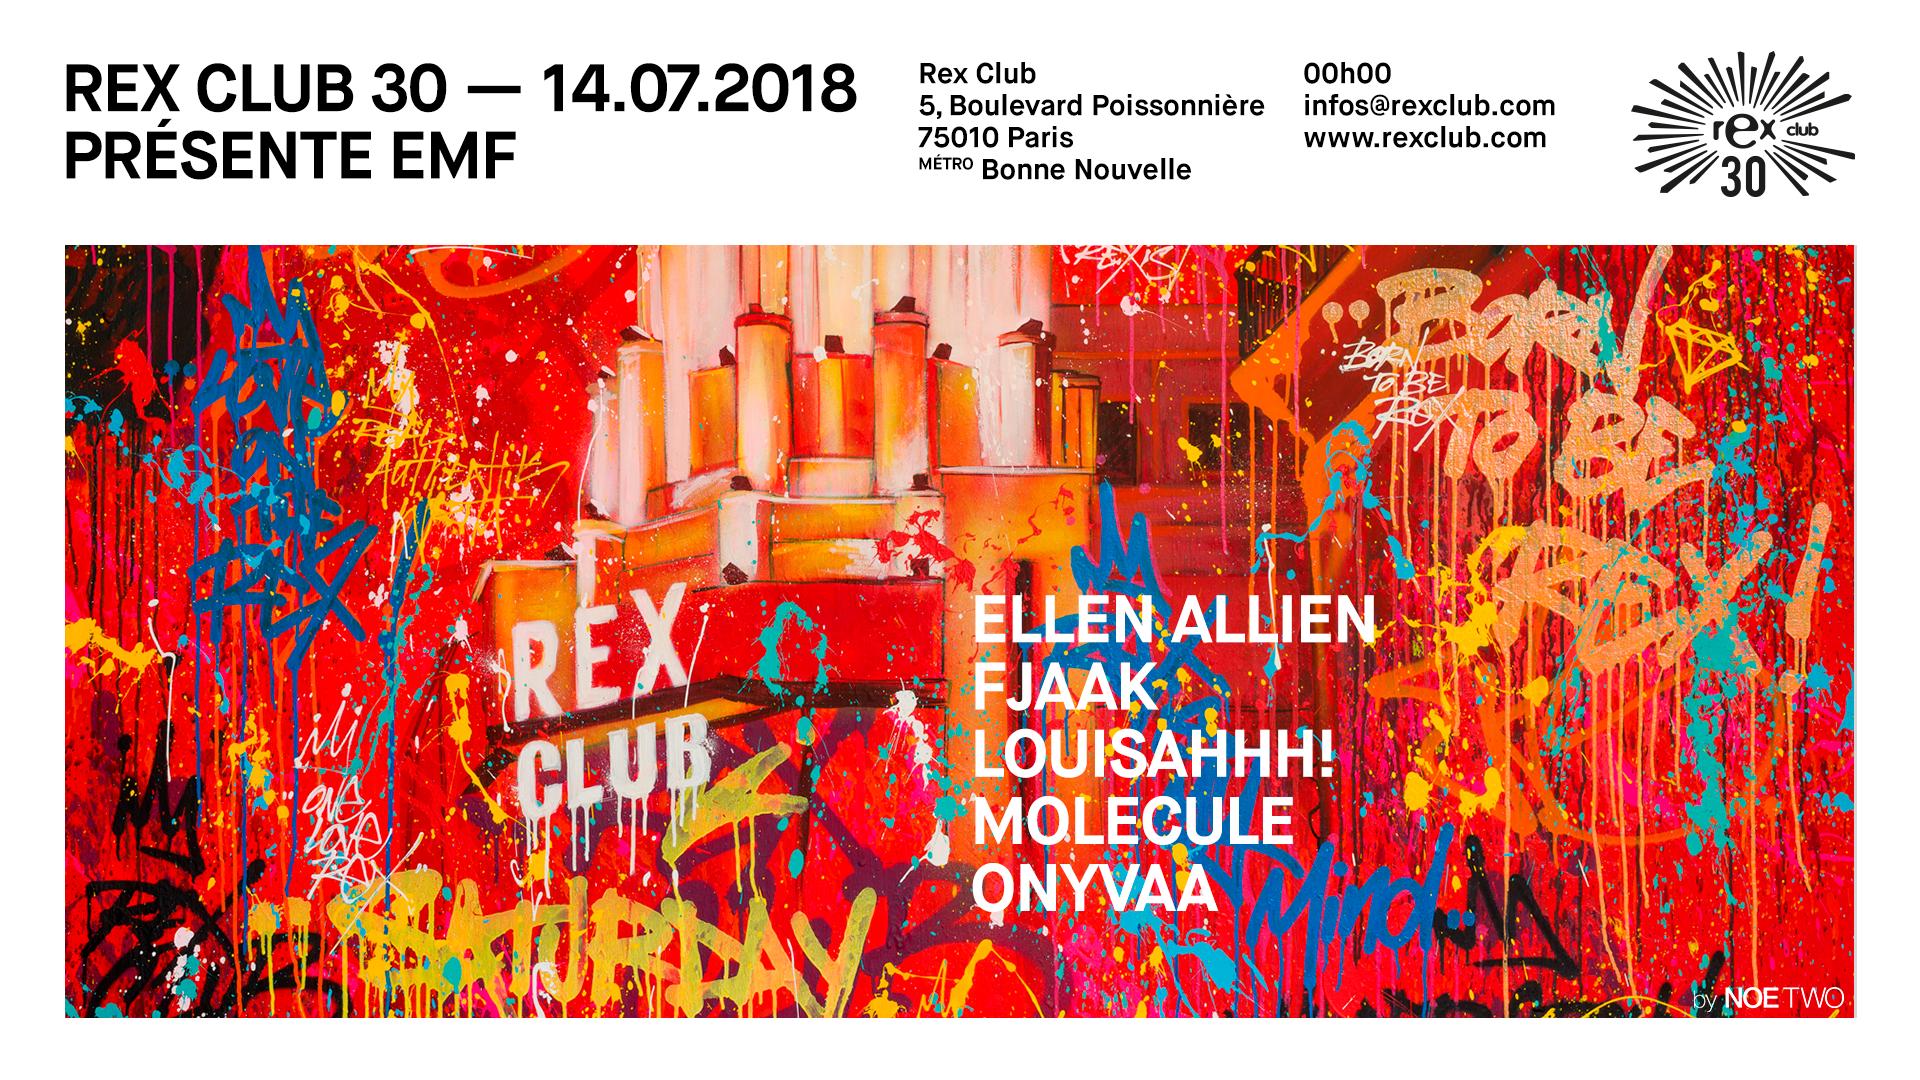 20180714_rex_club_30_emf_facebook_event_banner_1920x1080